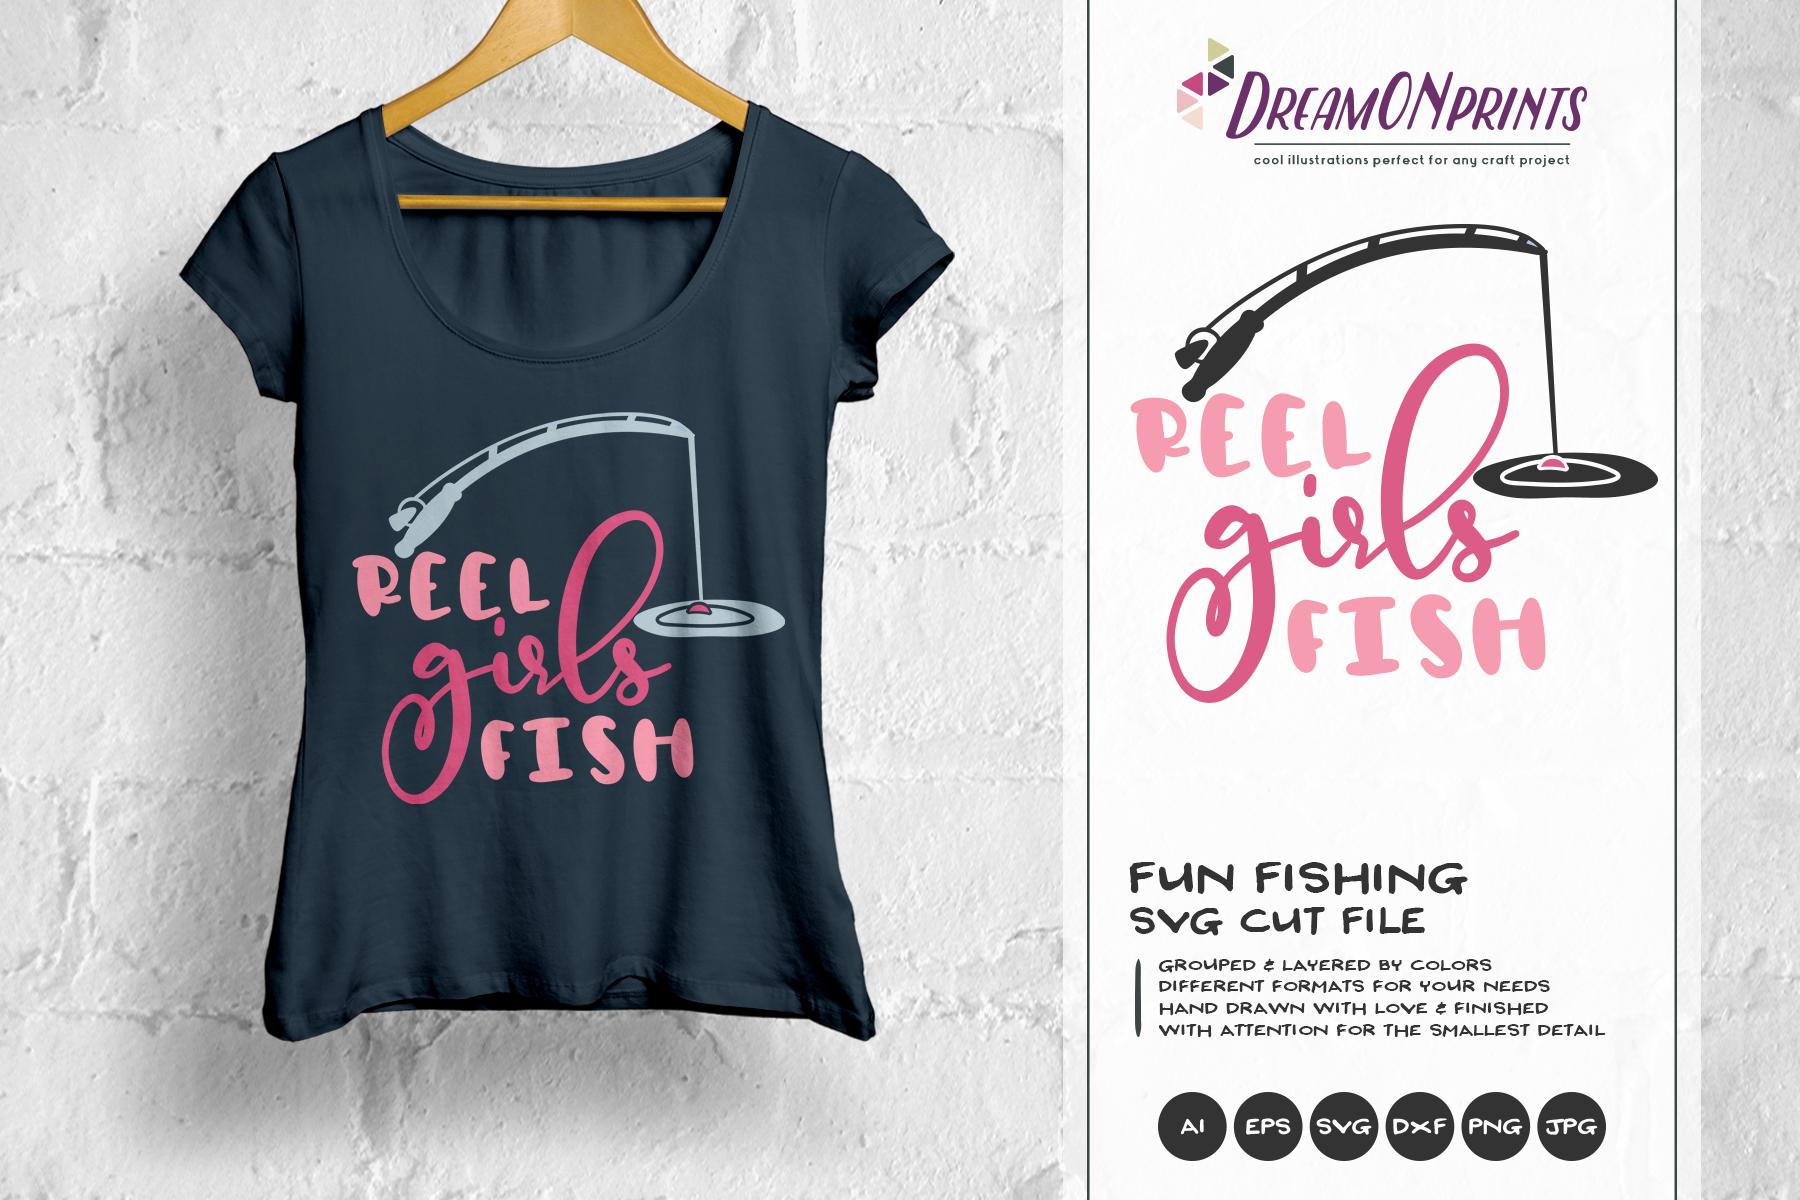 Fishing SVG - Reel Girls Fish SVG example image 1